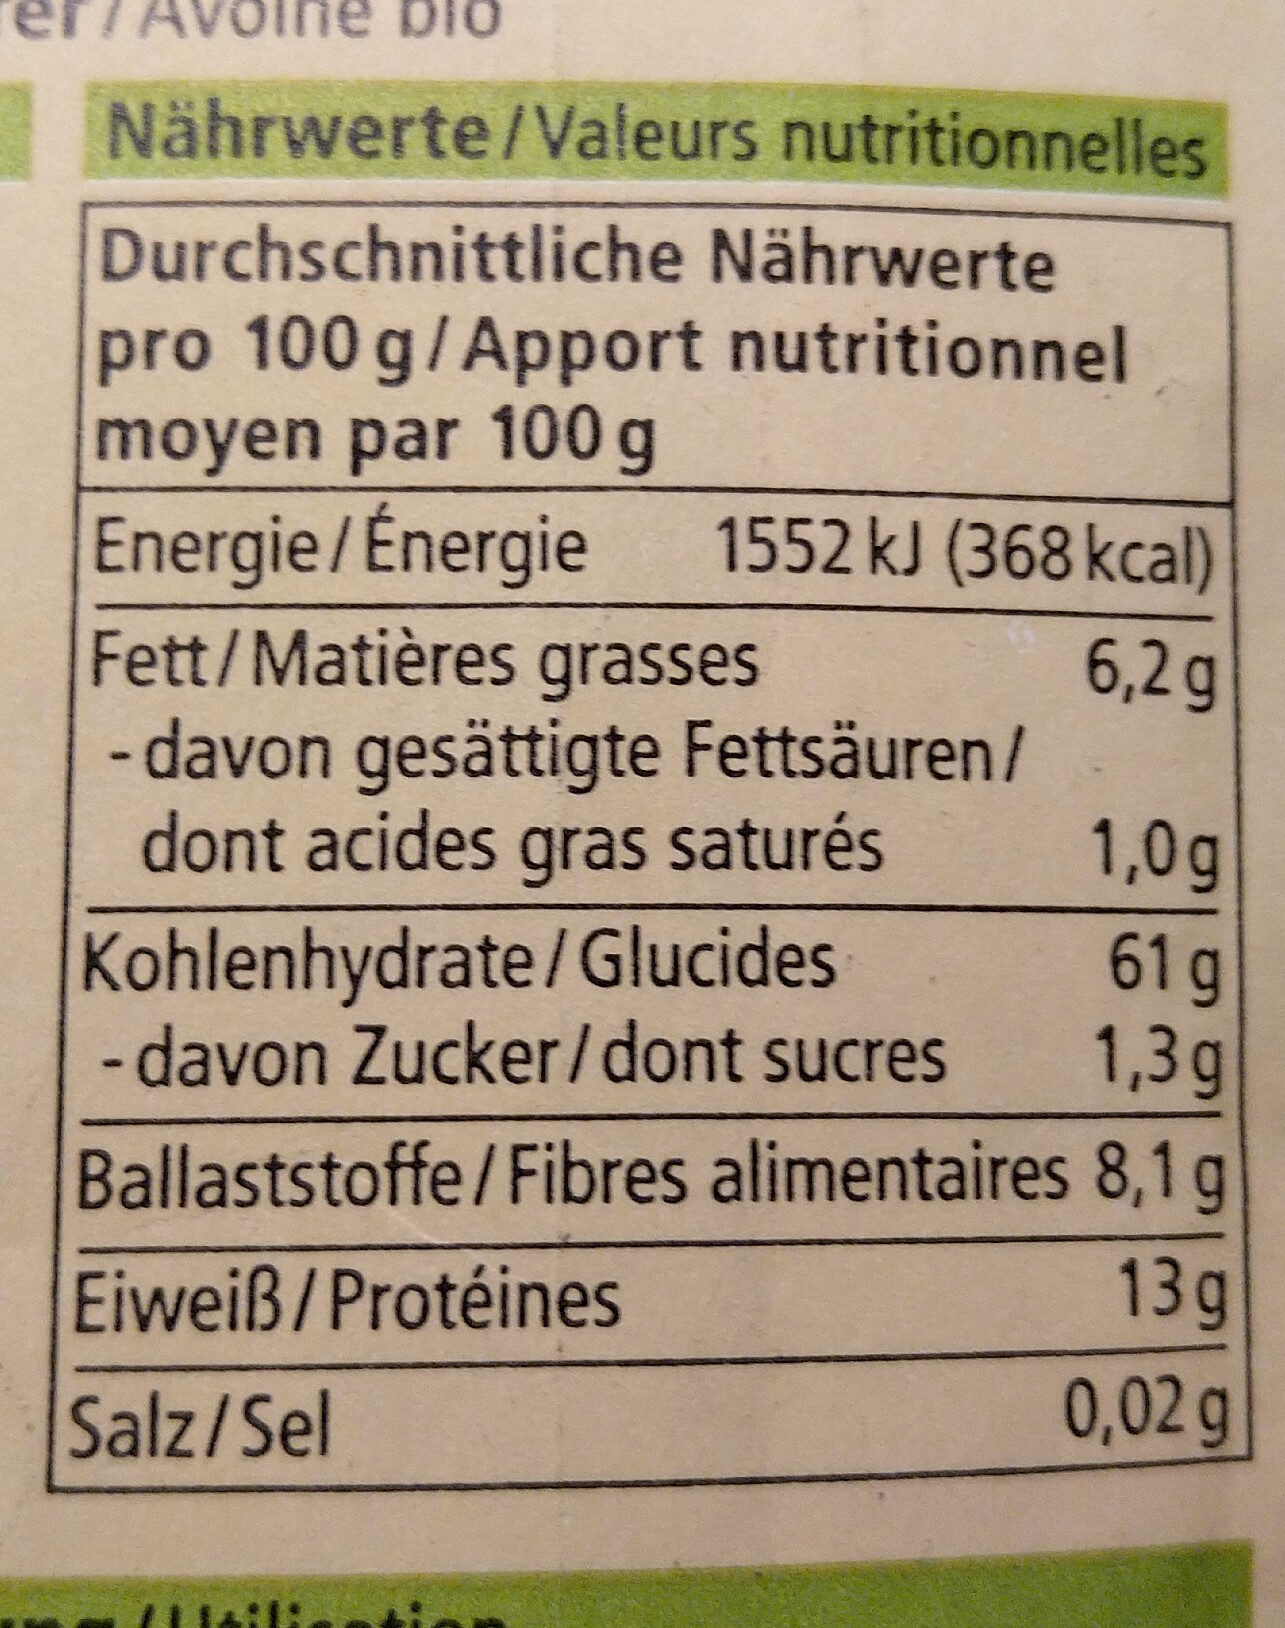 Alnatura Hafer - Informations nutritionnelles - fr